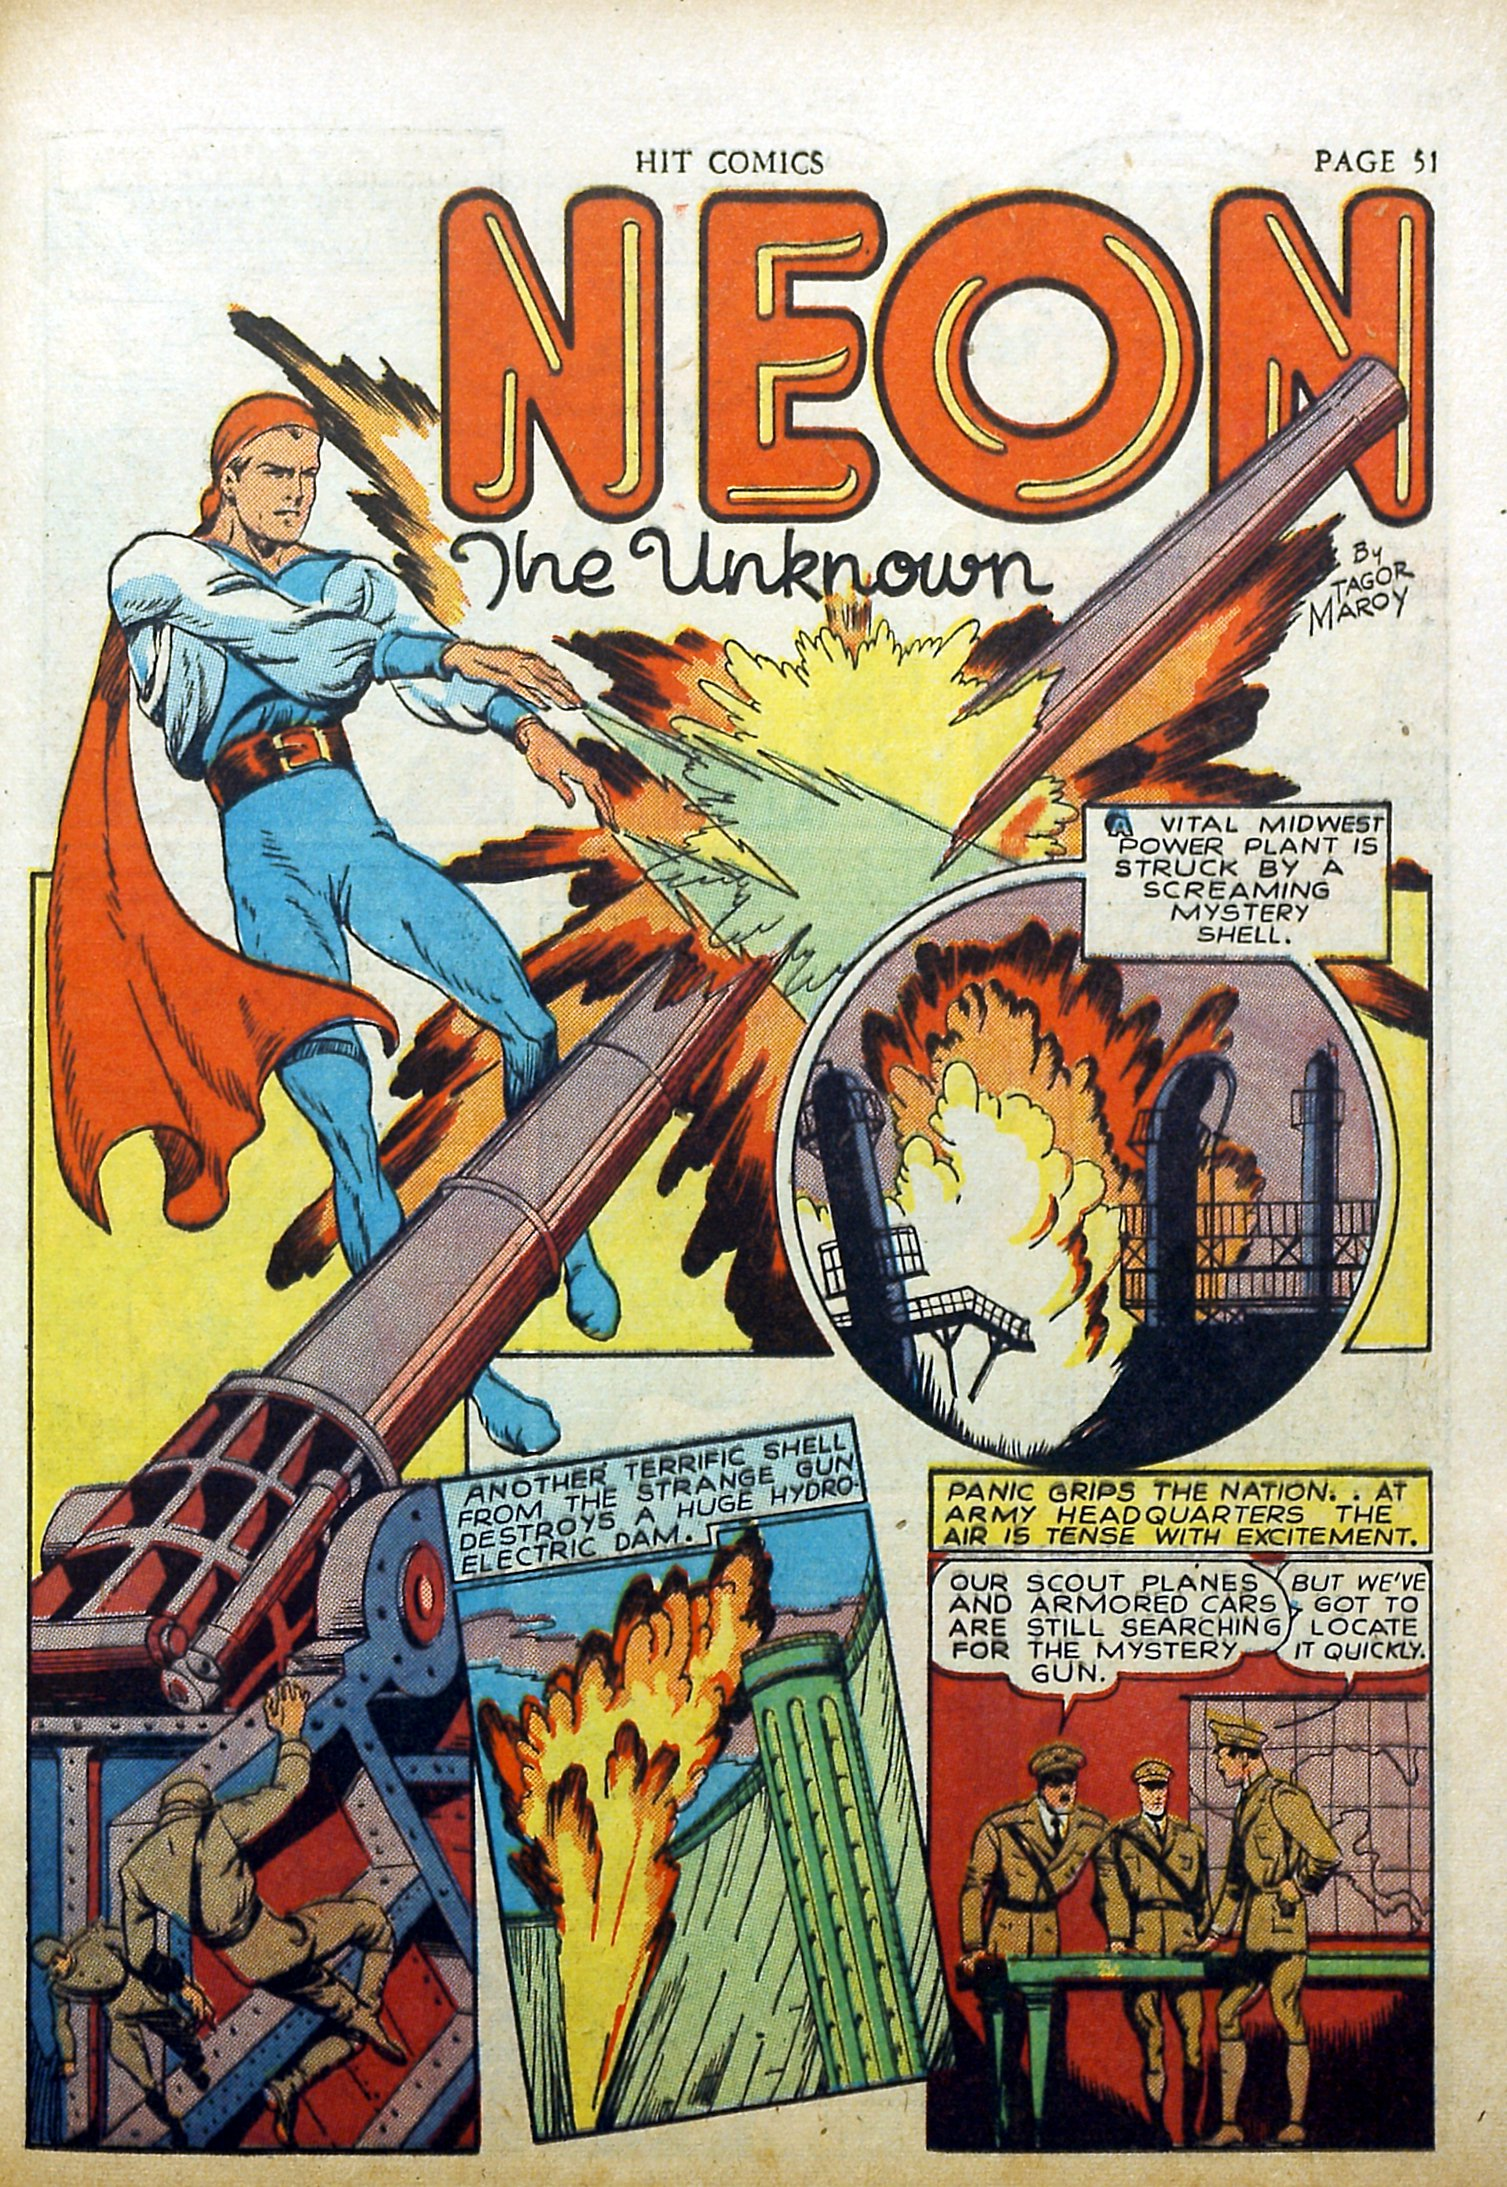 Read online Hit Comics comic -  Issue #17 - 53